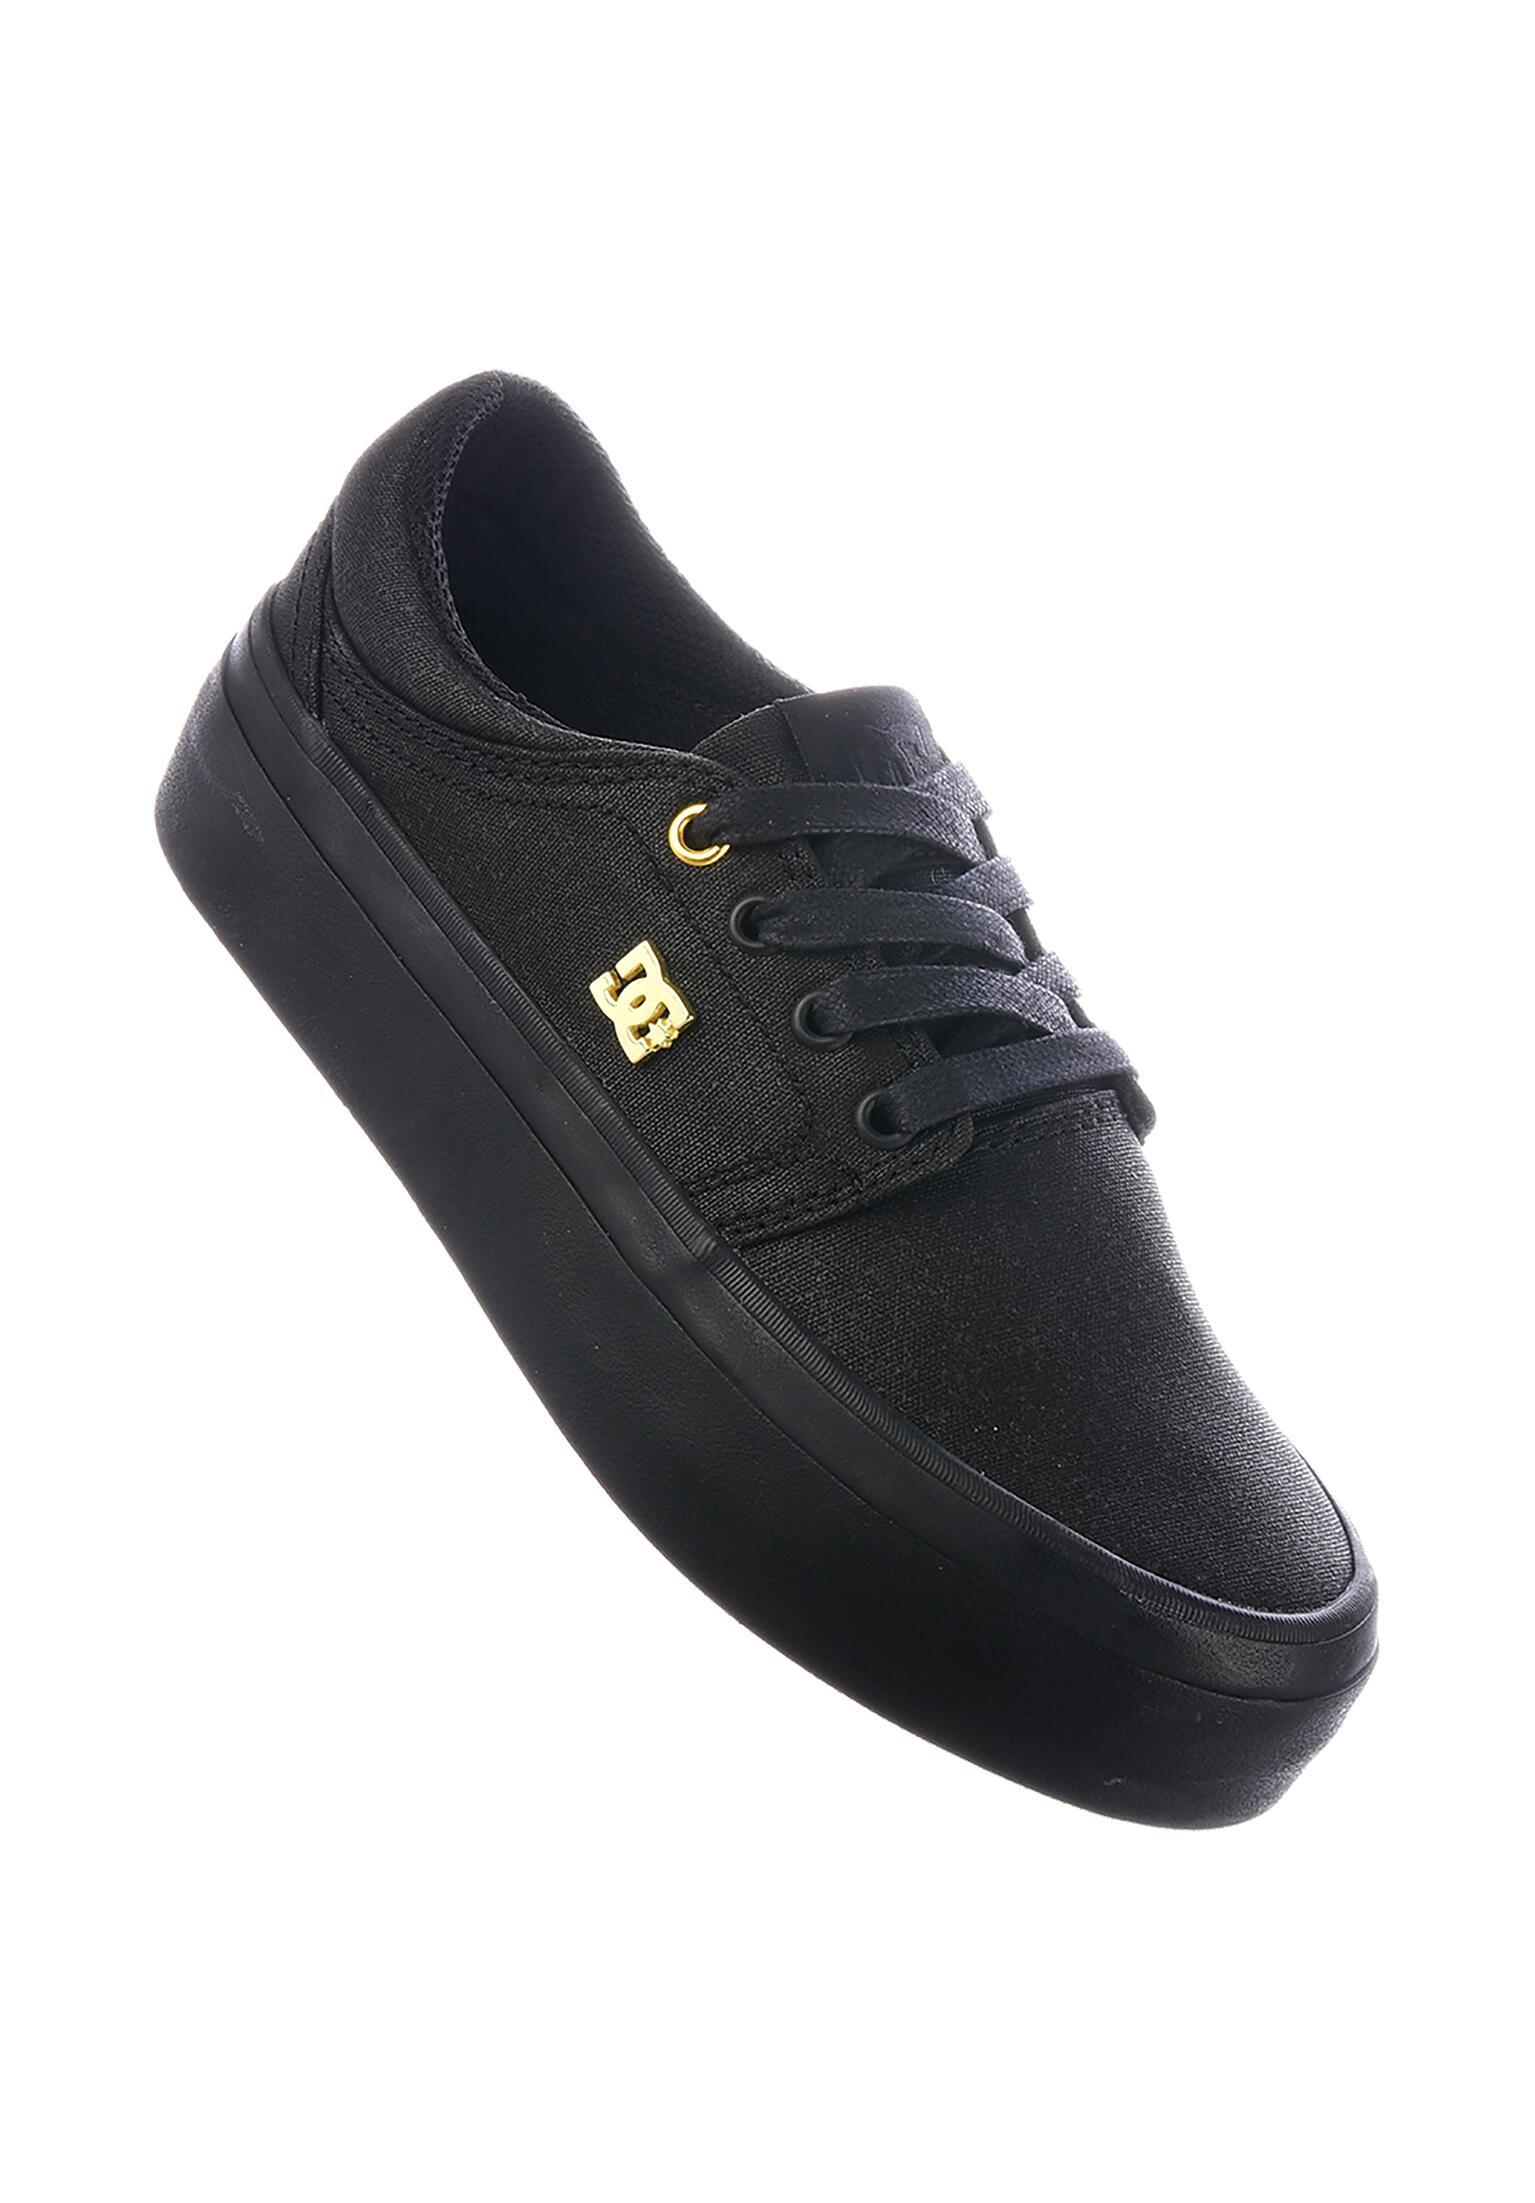 c69511ecb005 Trase Plattform TX SE DC Shoes Alle Schuhe in black-black für Damen | Titus